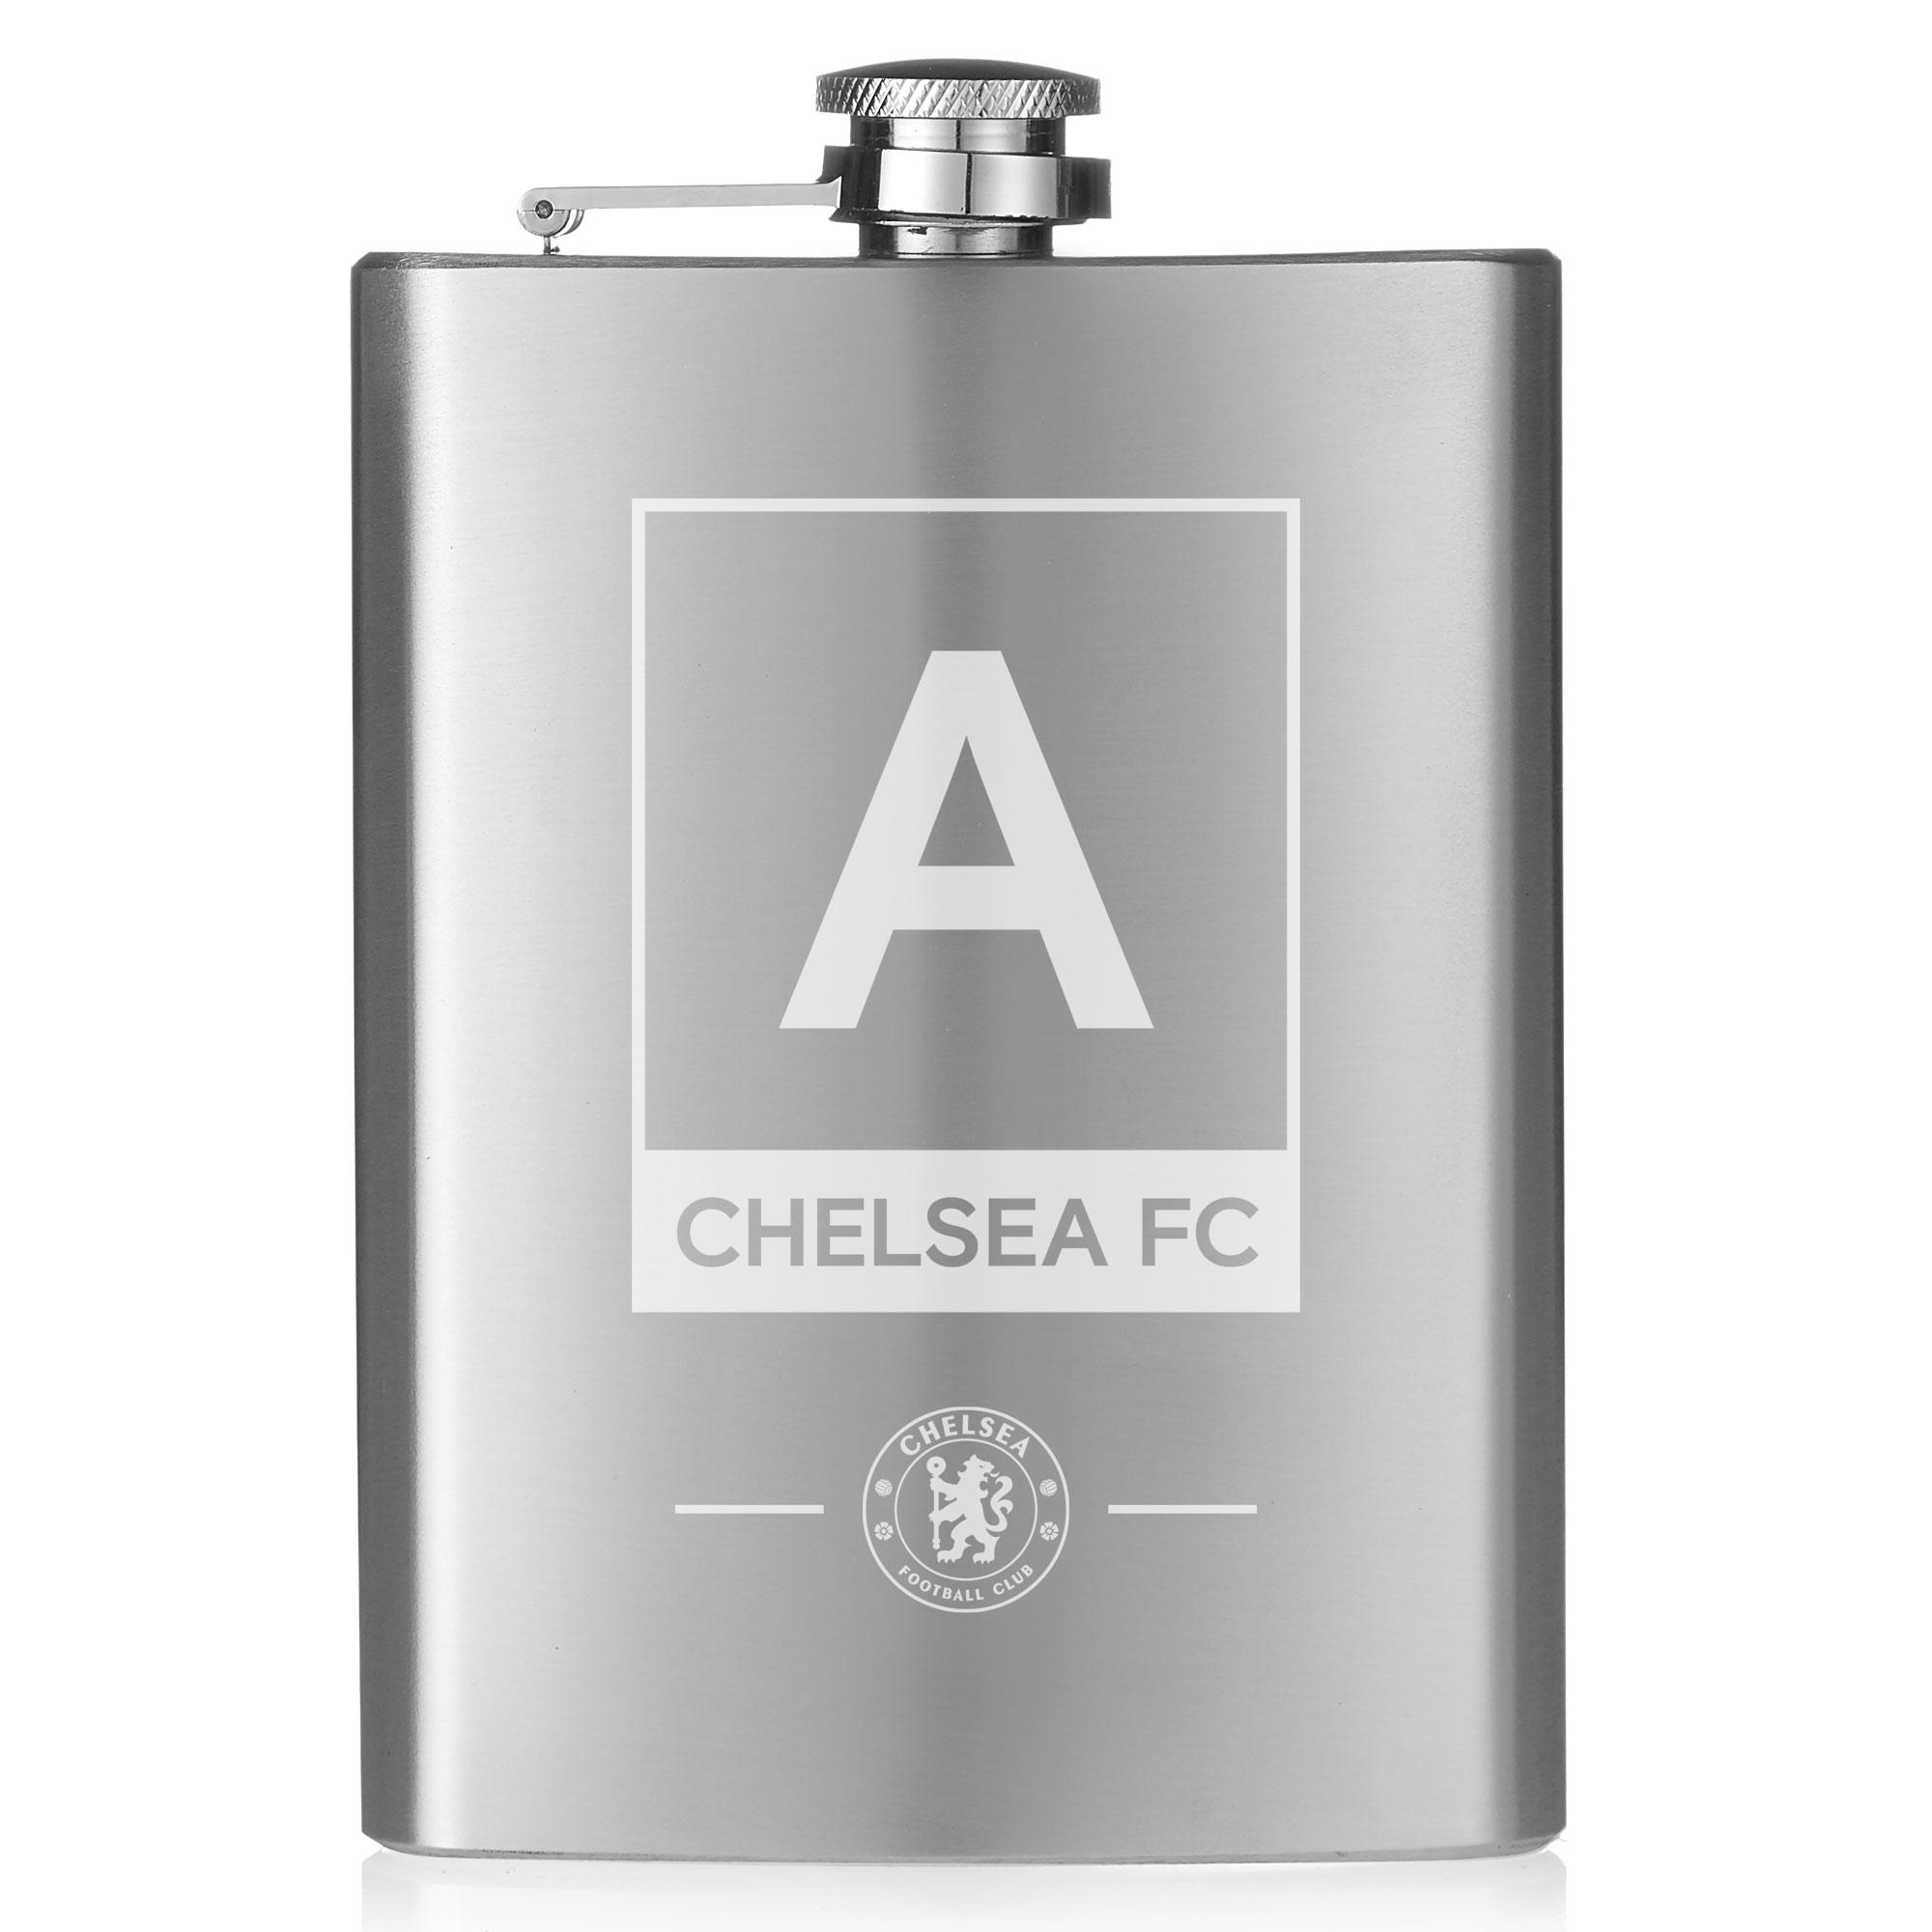 Chelsea FC Monogram Hip Flask